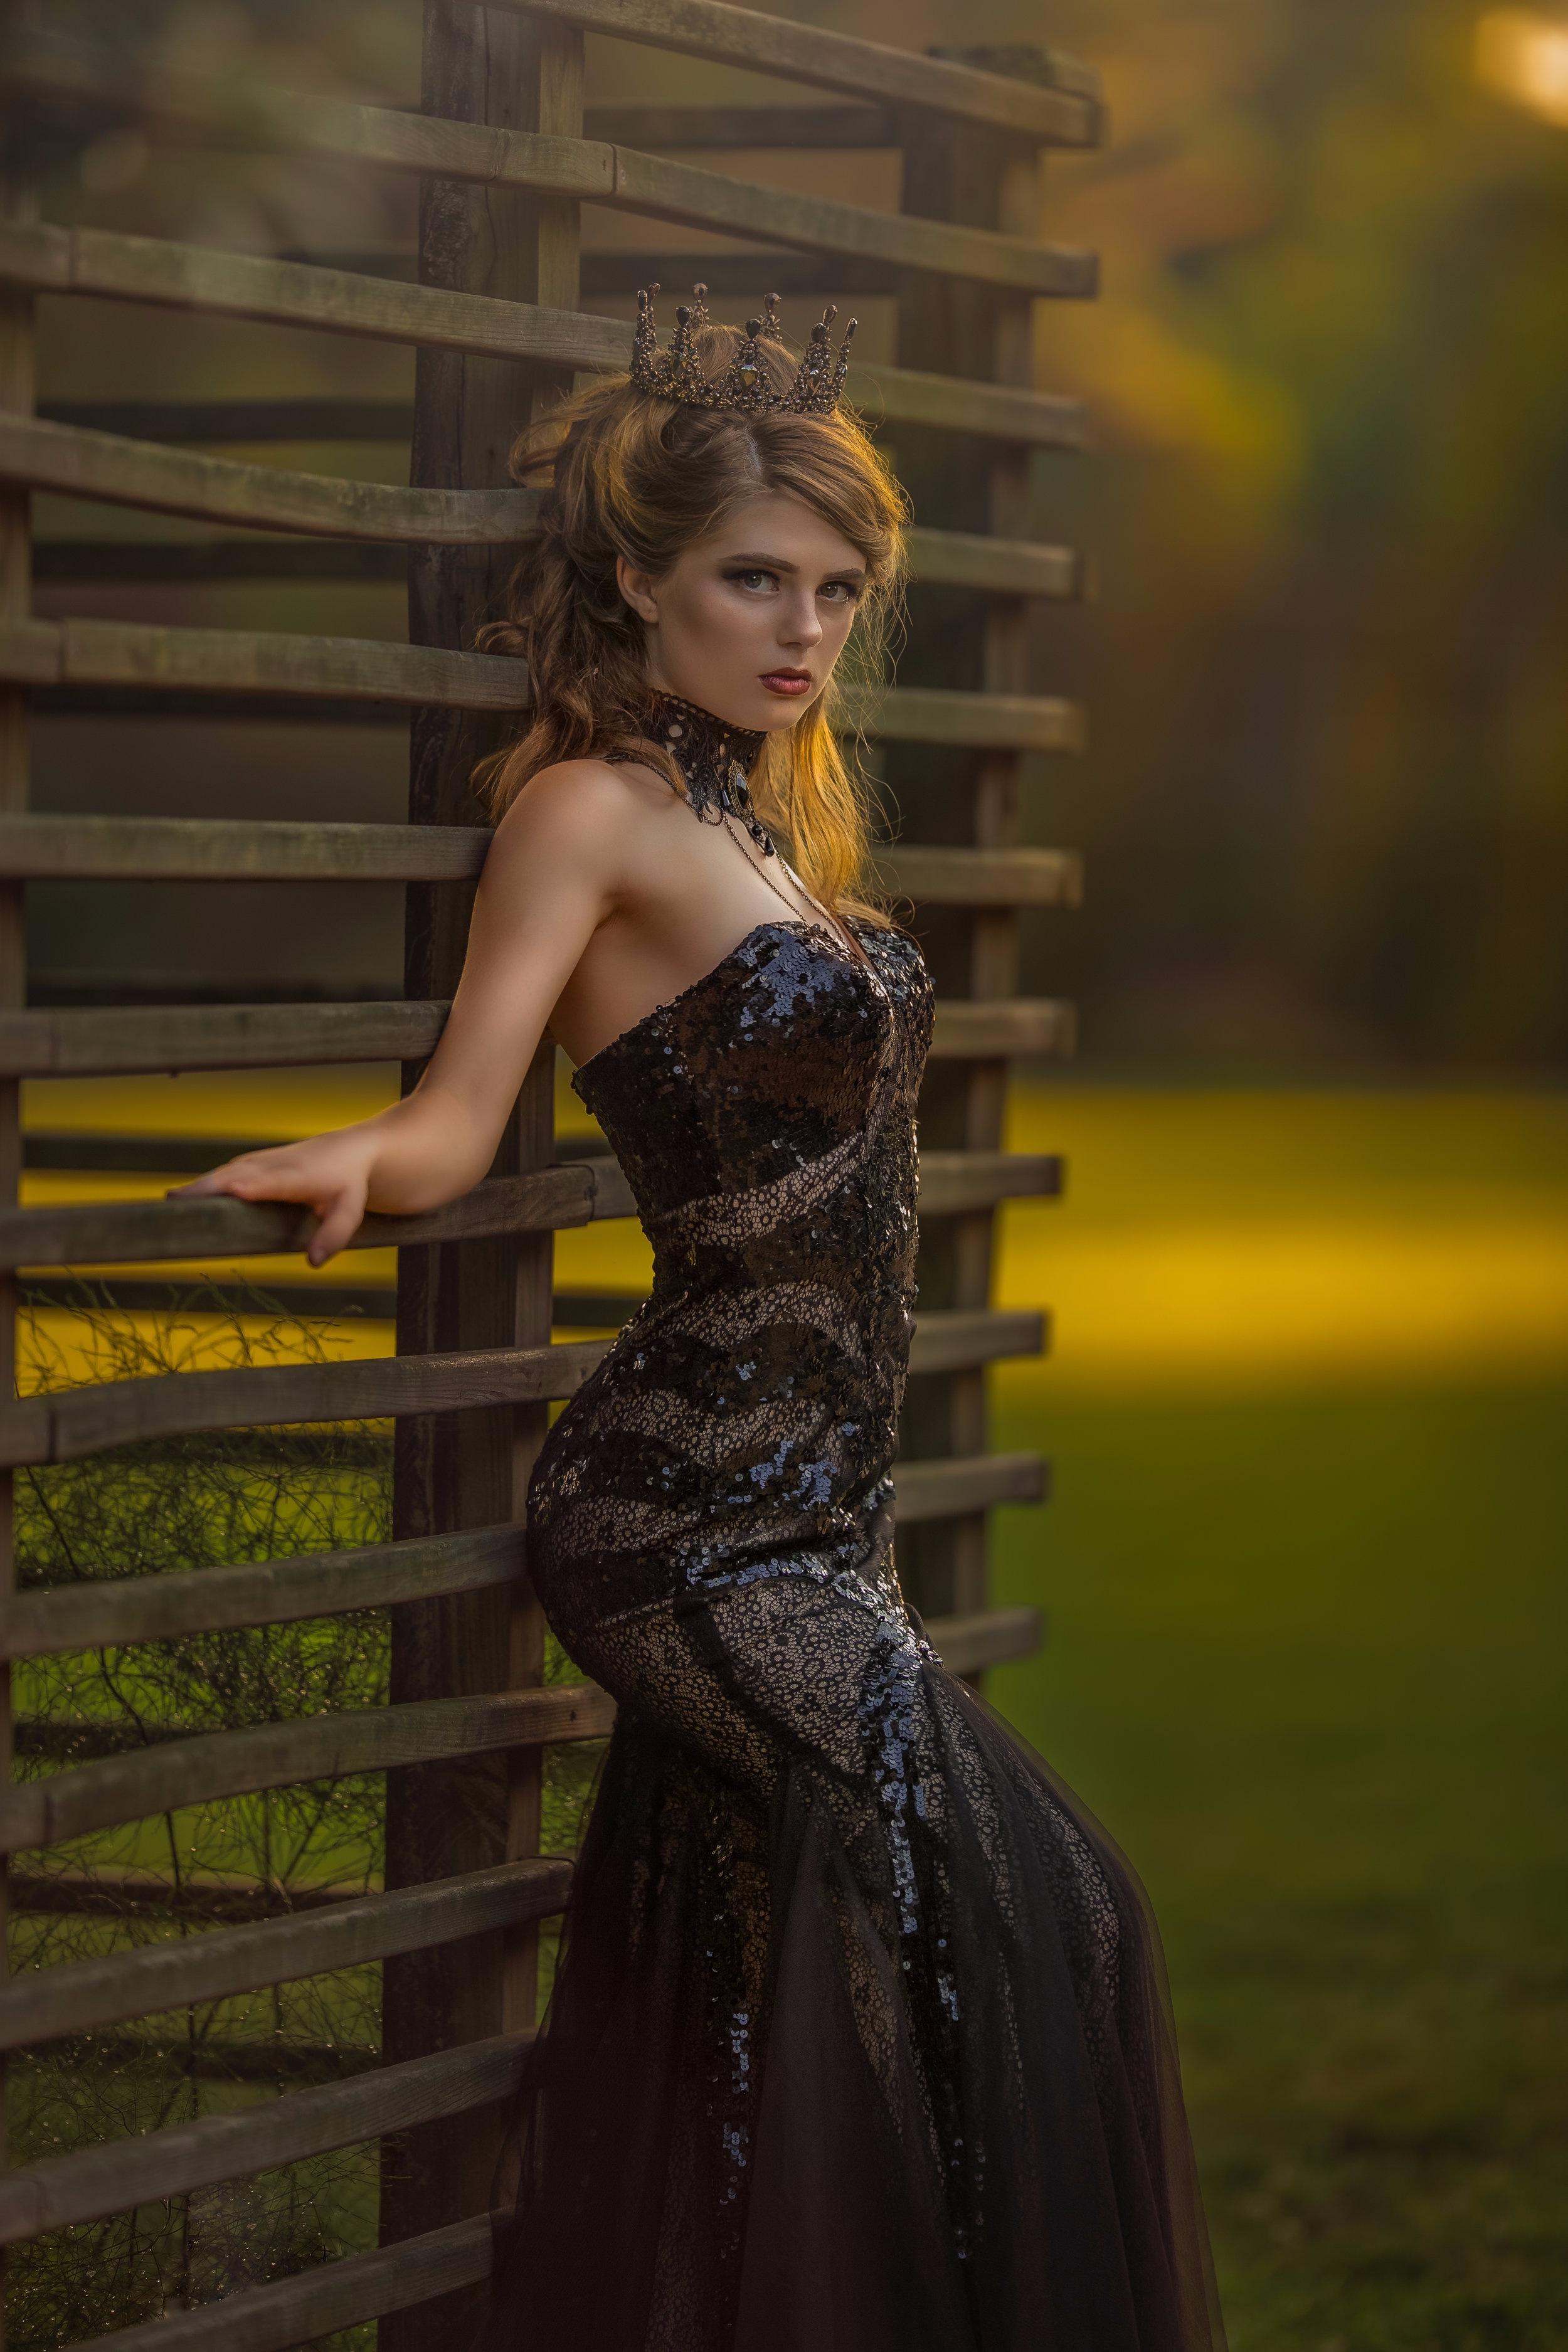 Tennessee fine art photographer